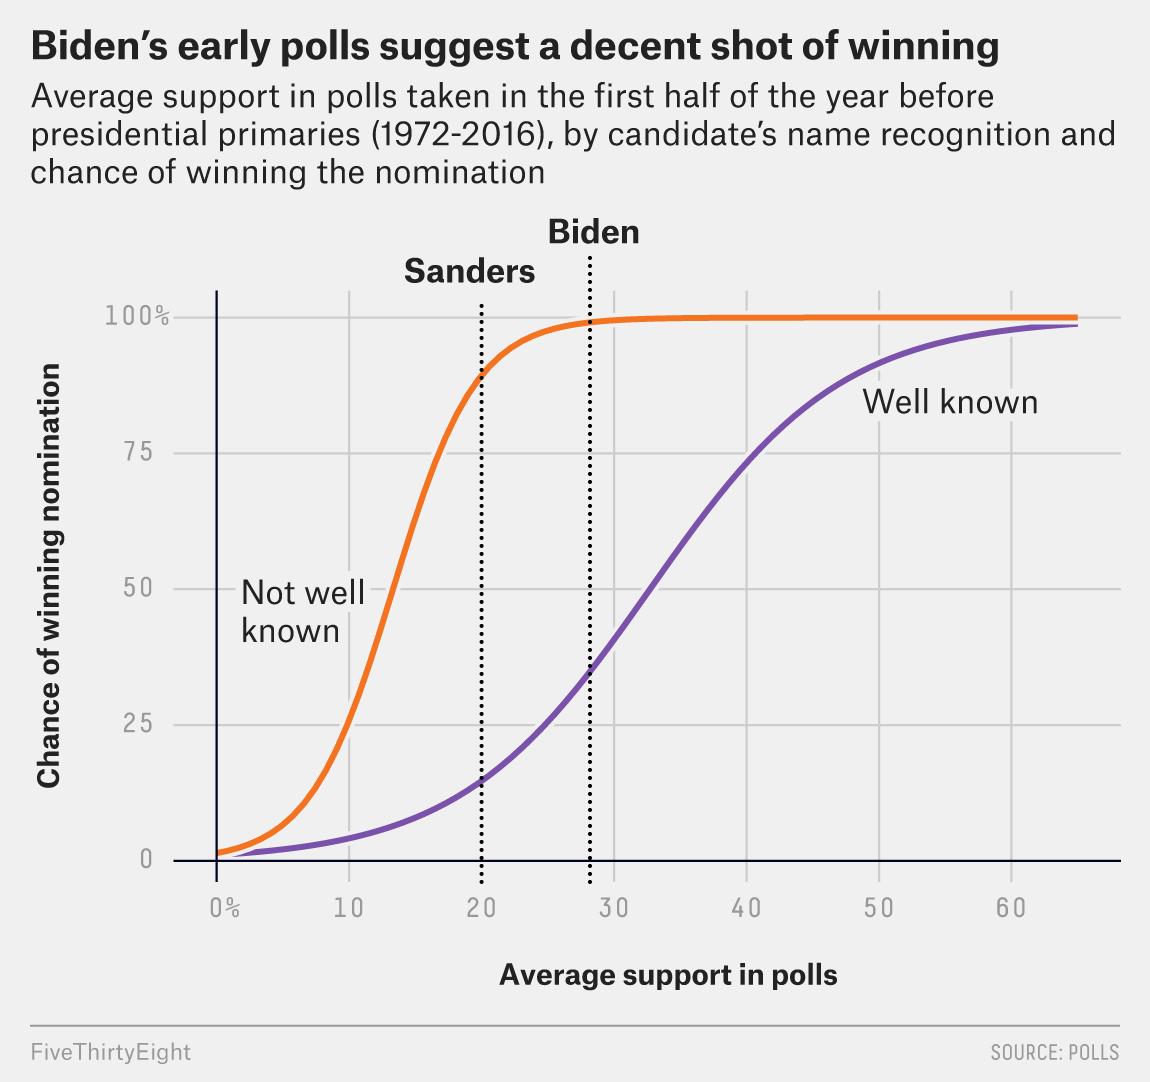 New Government Report Suggests 1 In 40 >> How Joe Biden Could Win The 2020 Democratic Primary Fivethirtyeight